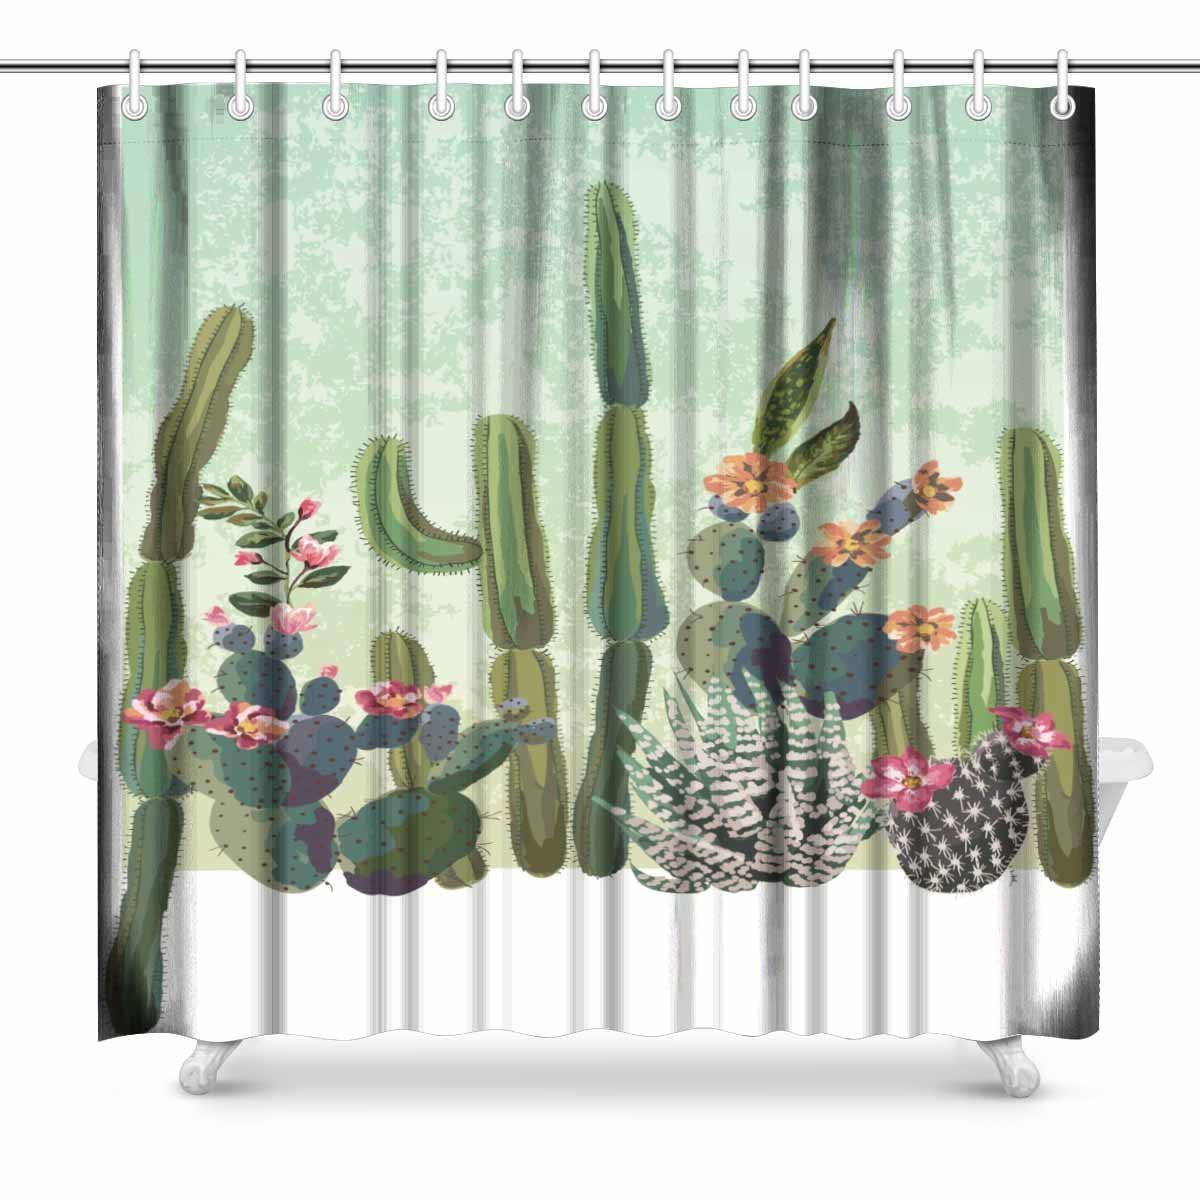 Aplysia Cute Succulents Cactus Bathroom Shower Curtain Accessories